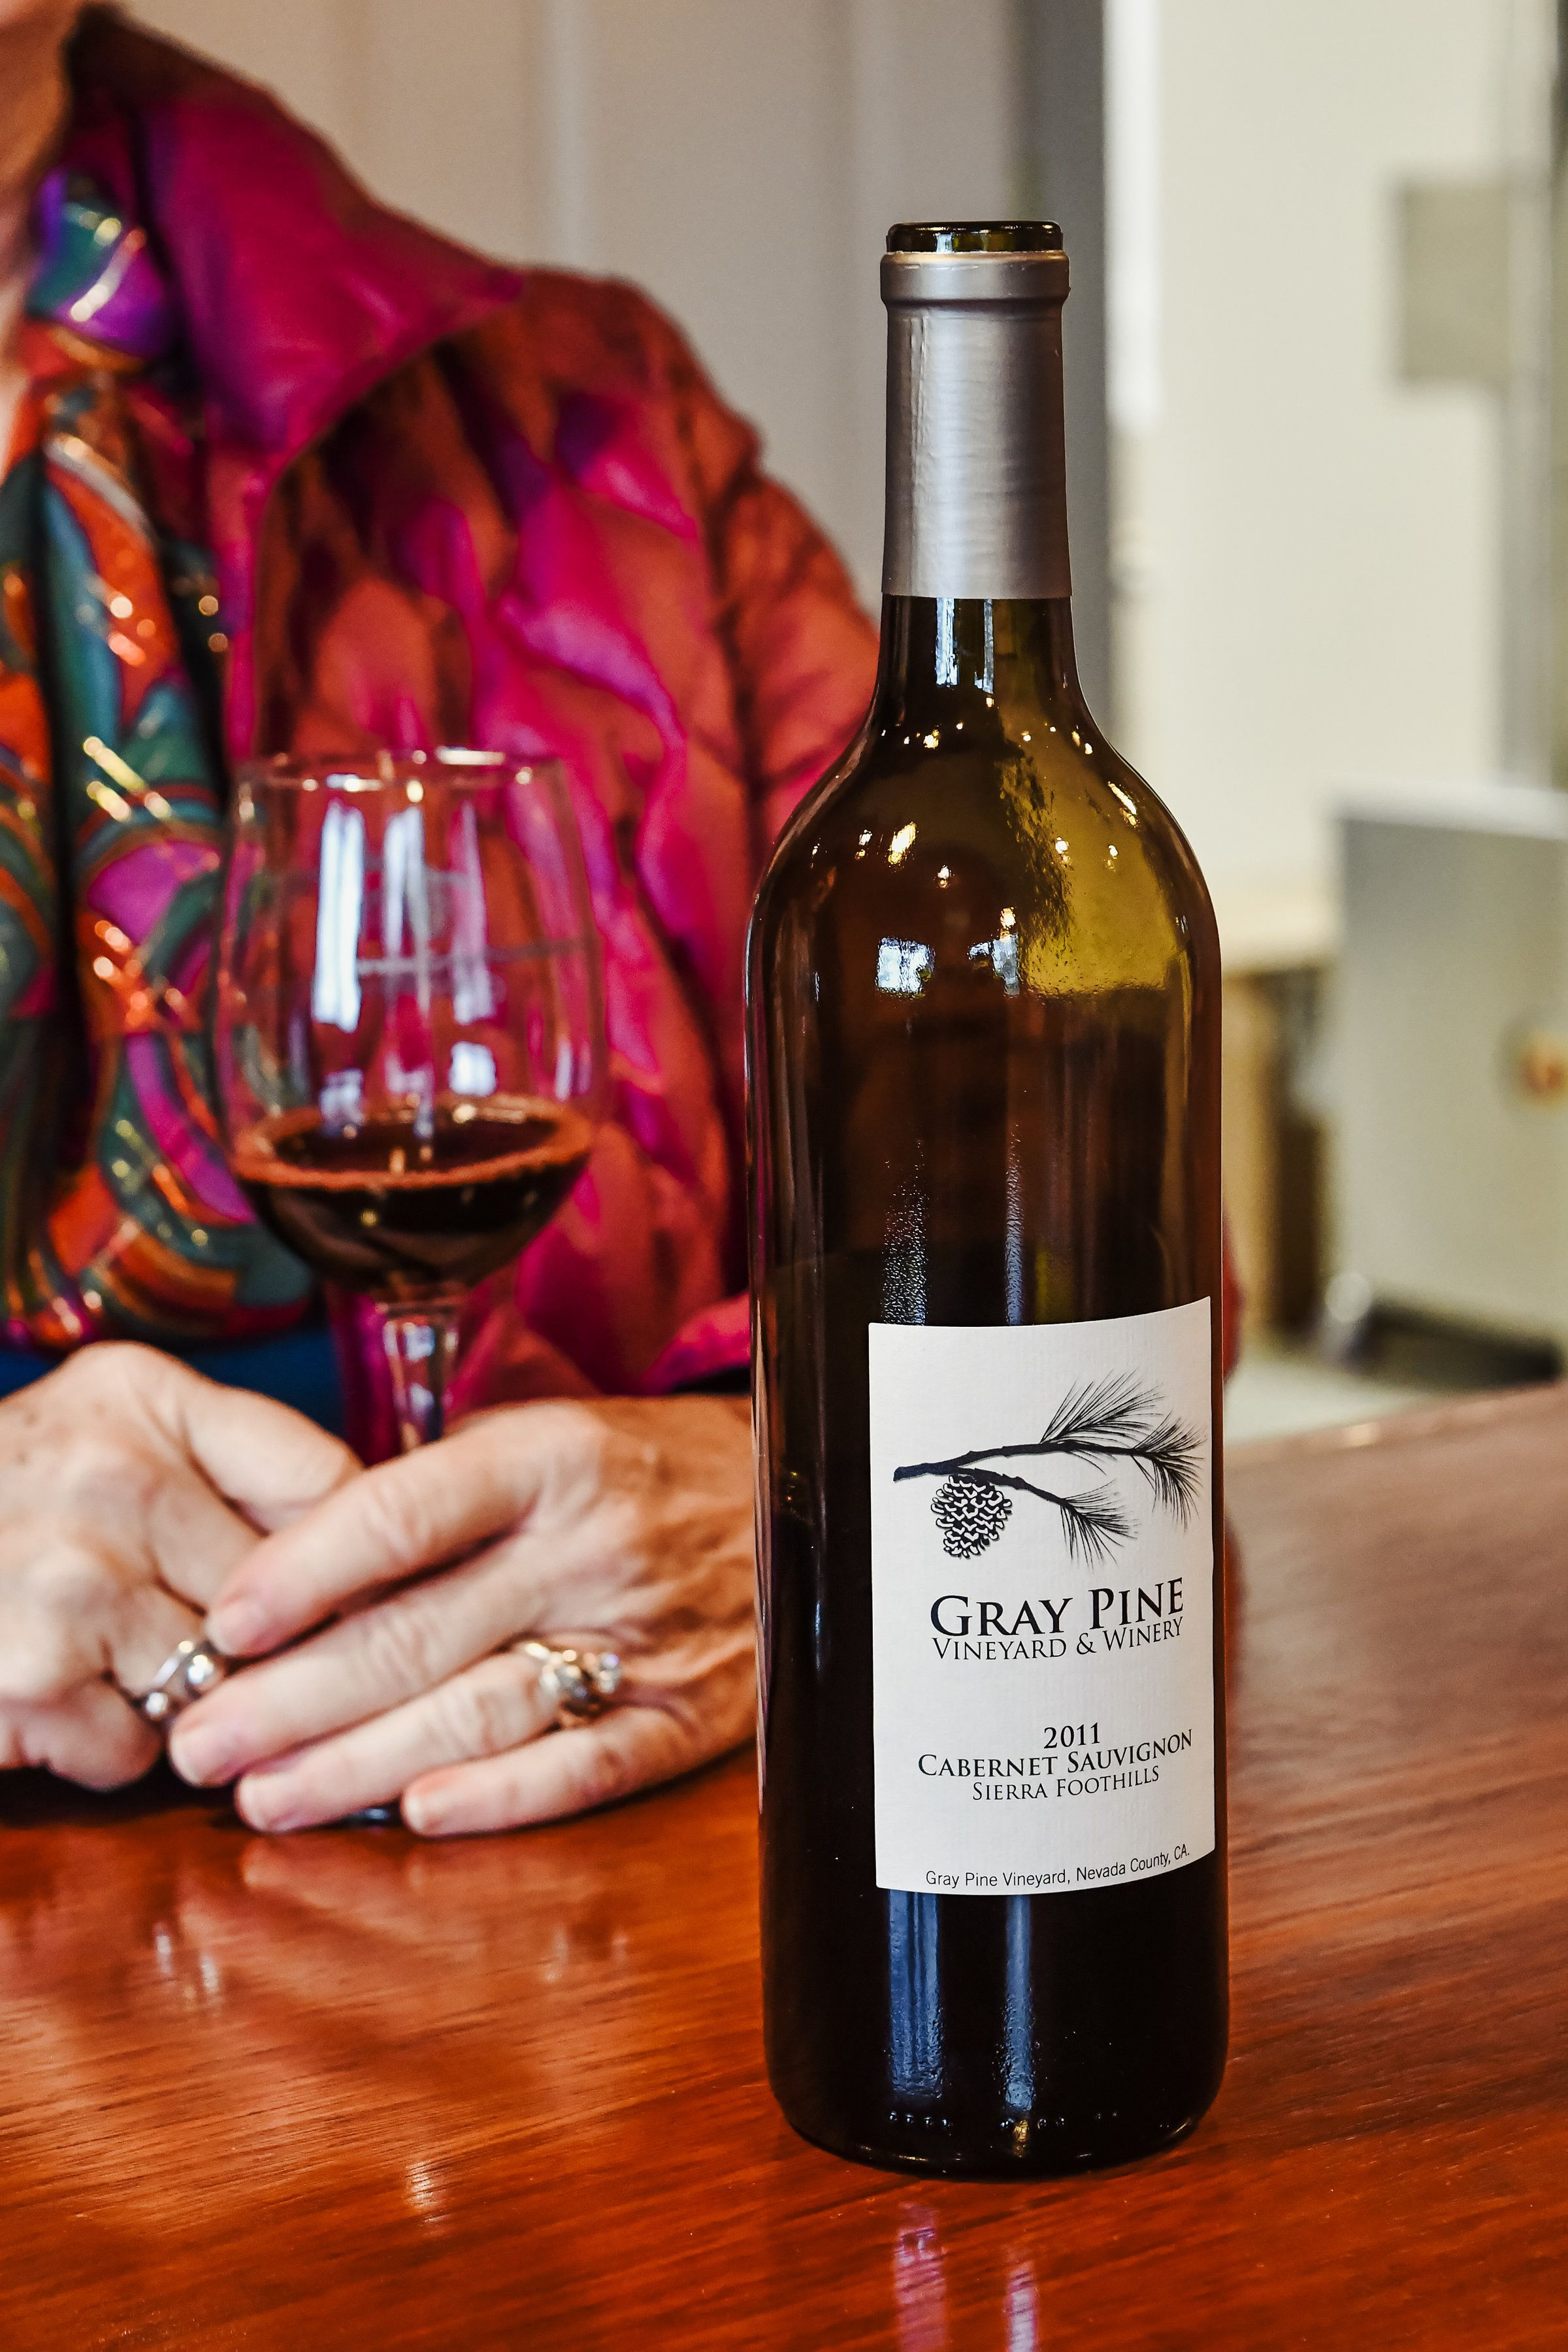 Gray Pine Winery Wineoclock Wine Winetasting Wine Wine Bottle Winery